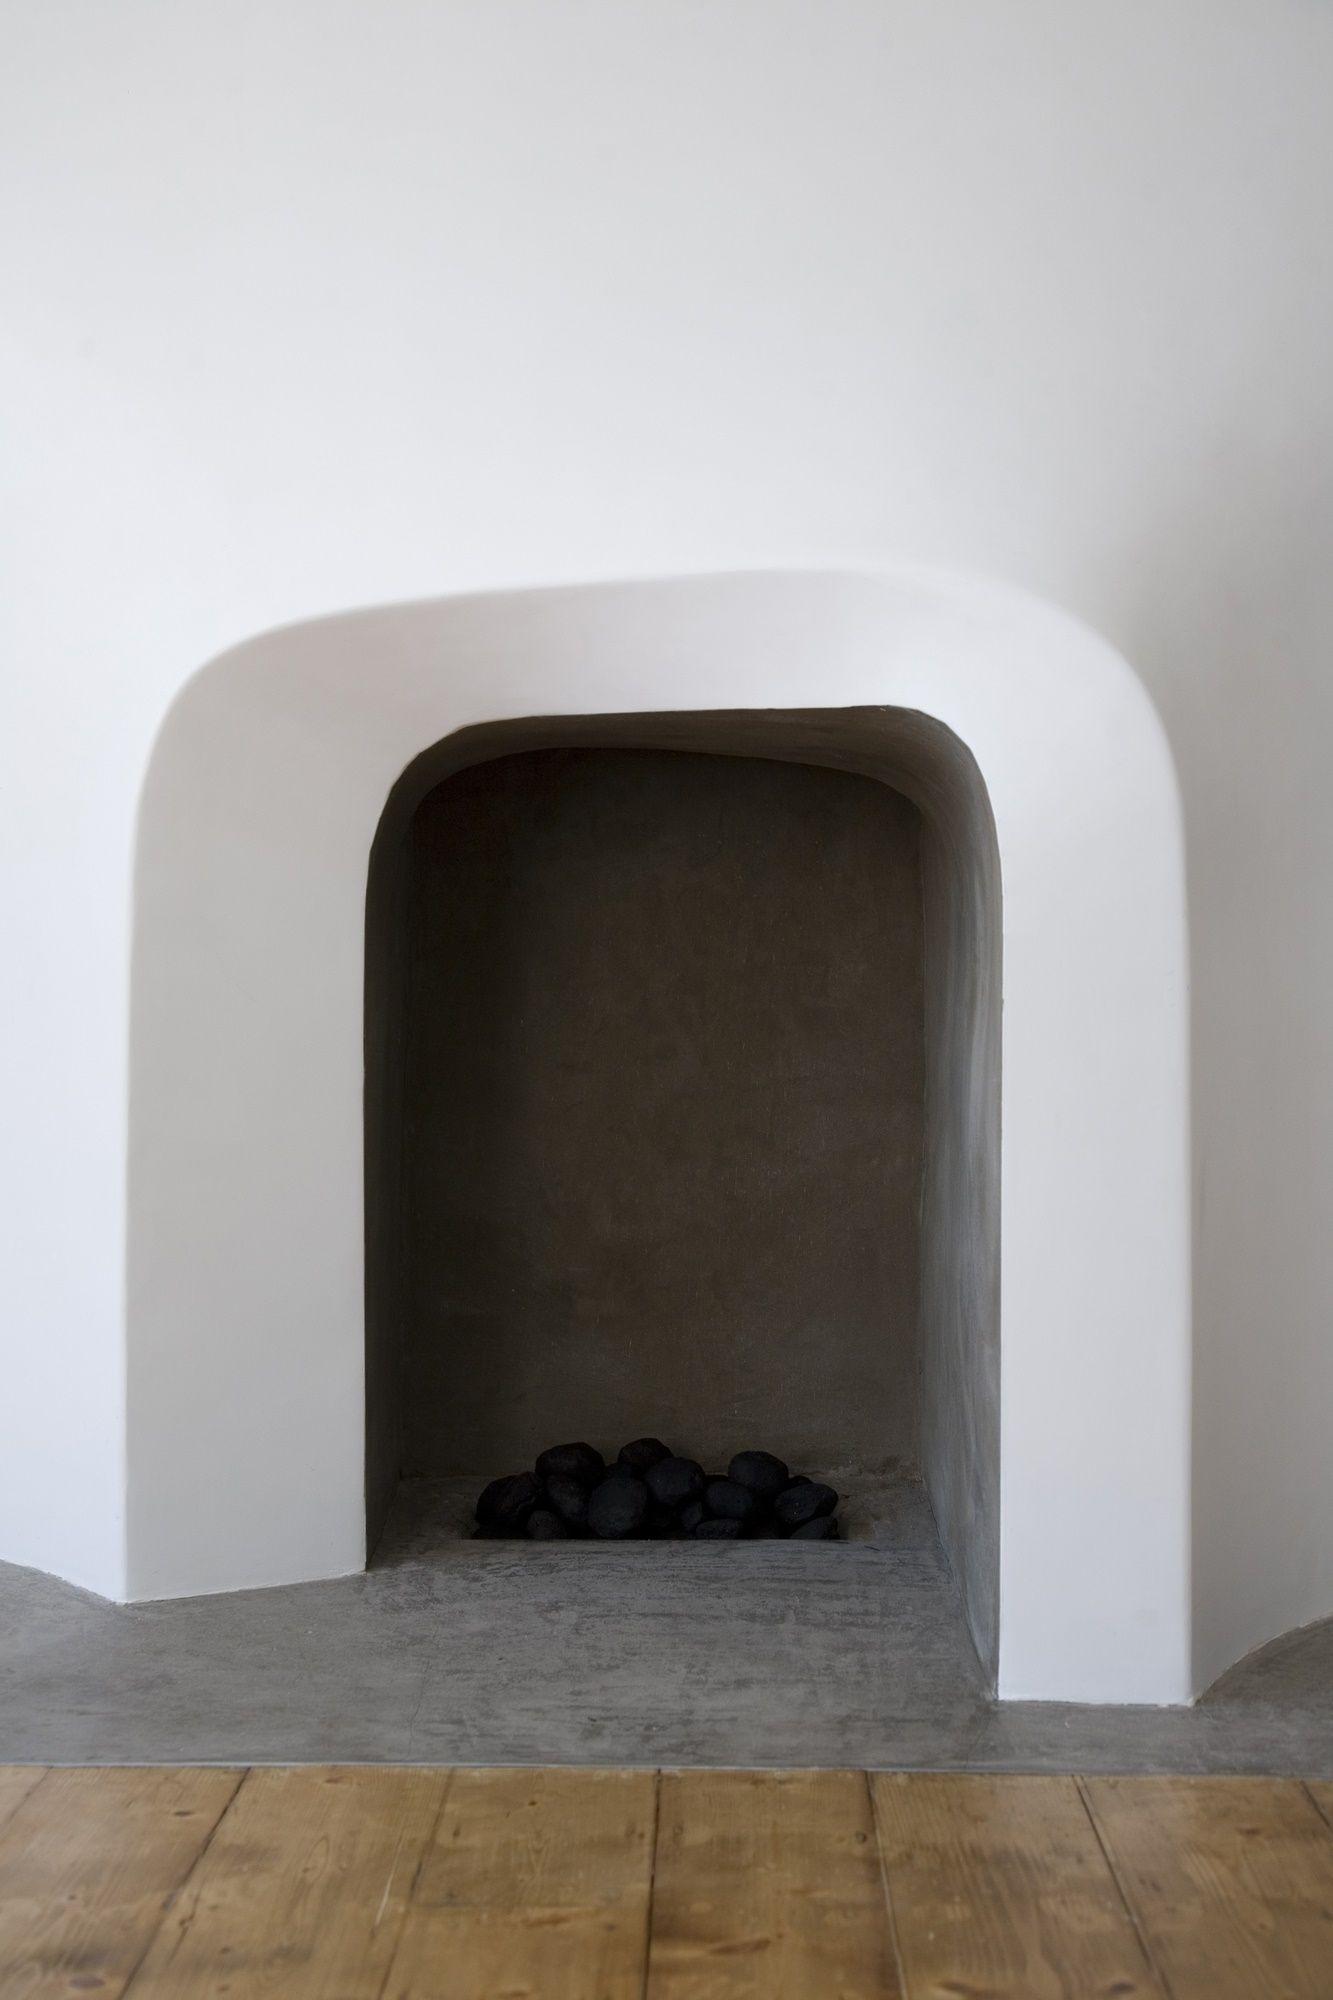 Focal Shift Fireplace By Scenario Architecture London Uk Fireplace Fireplace Design Interior Design Inspiration